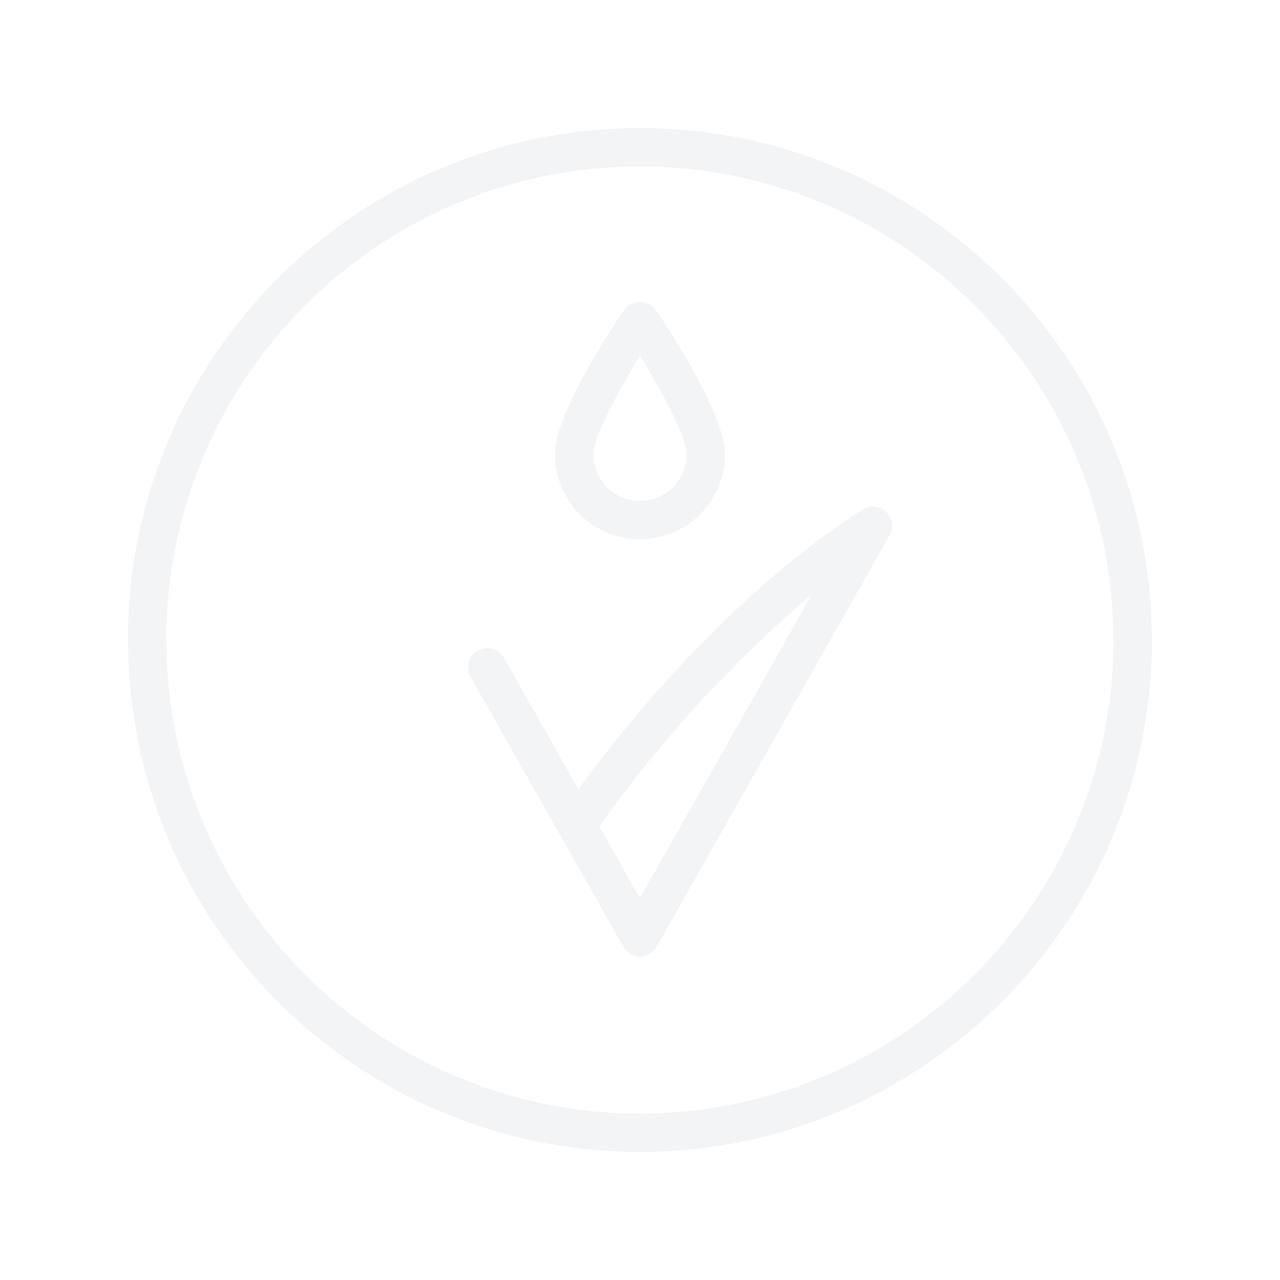 SCHWARZKOPF PROFESSIONAL BC Collagen Volume Boost Whipped Conditioner 150ml